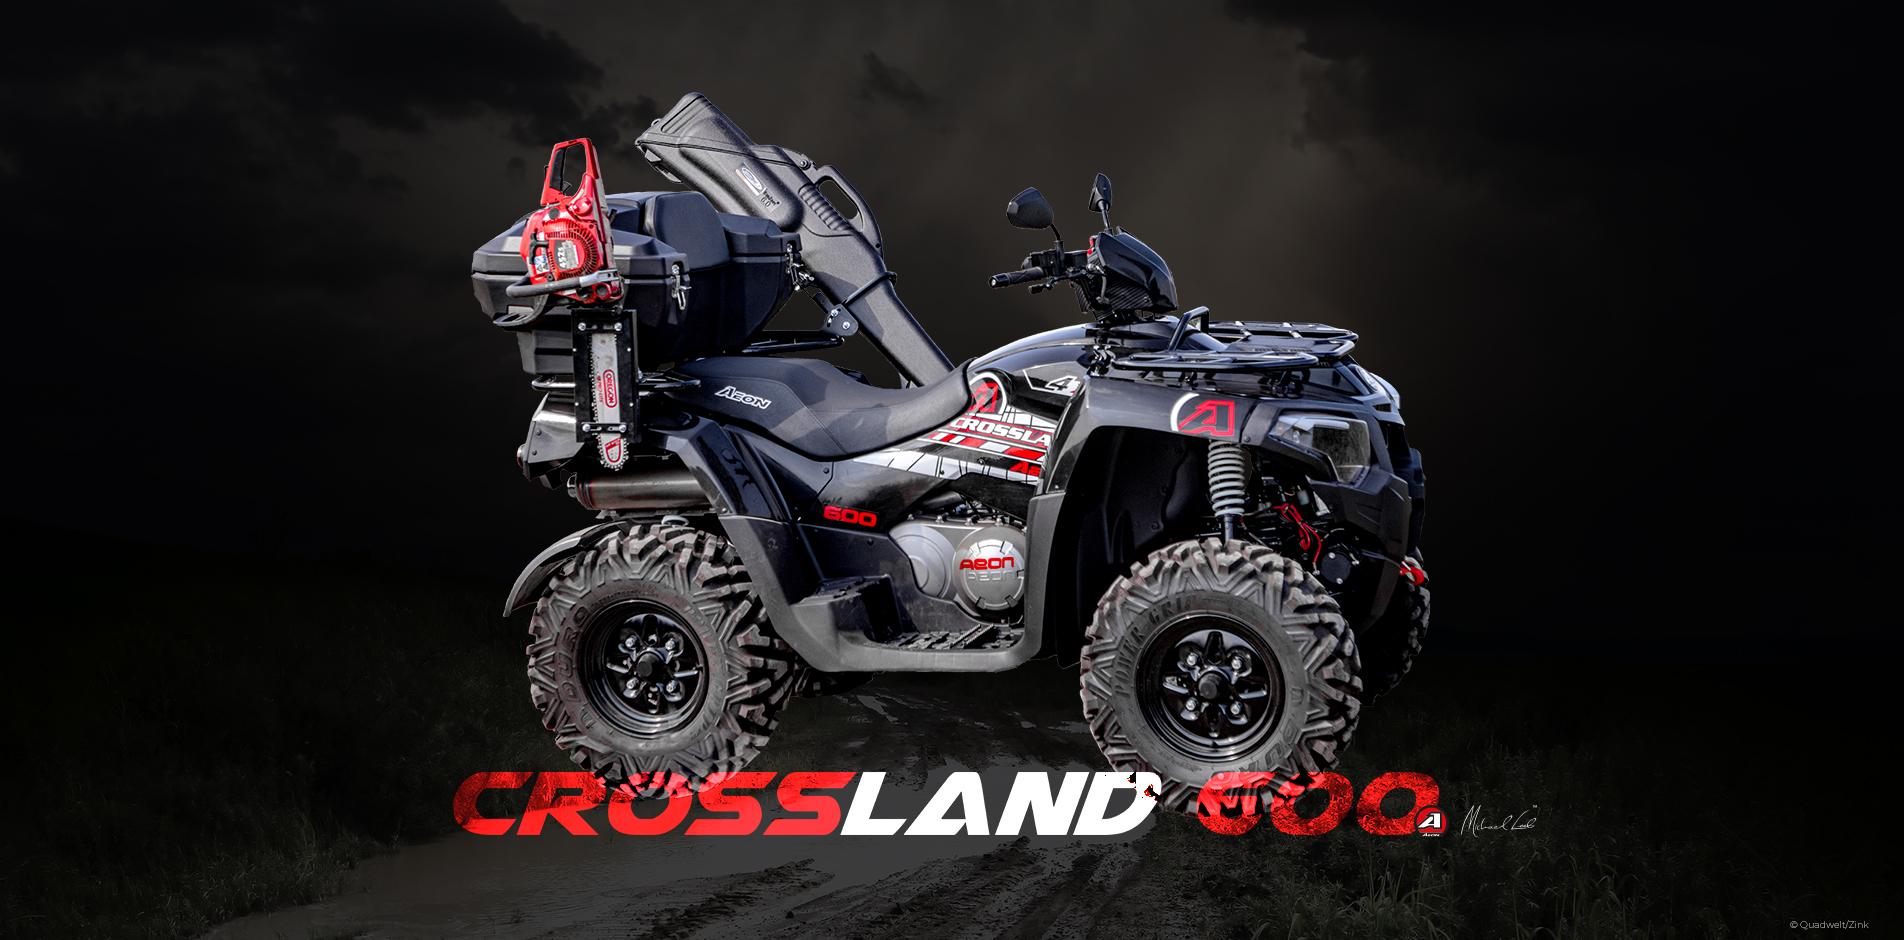 Crossland 600